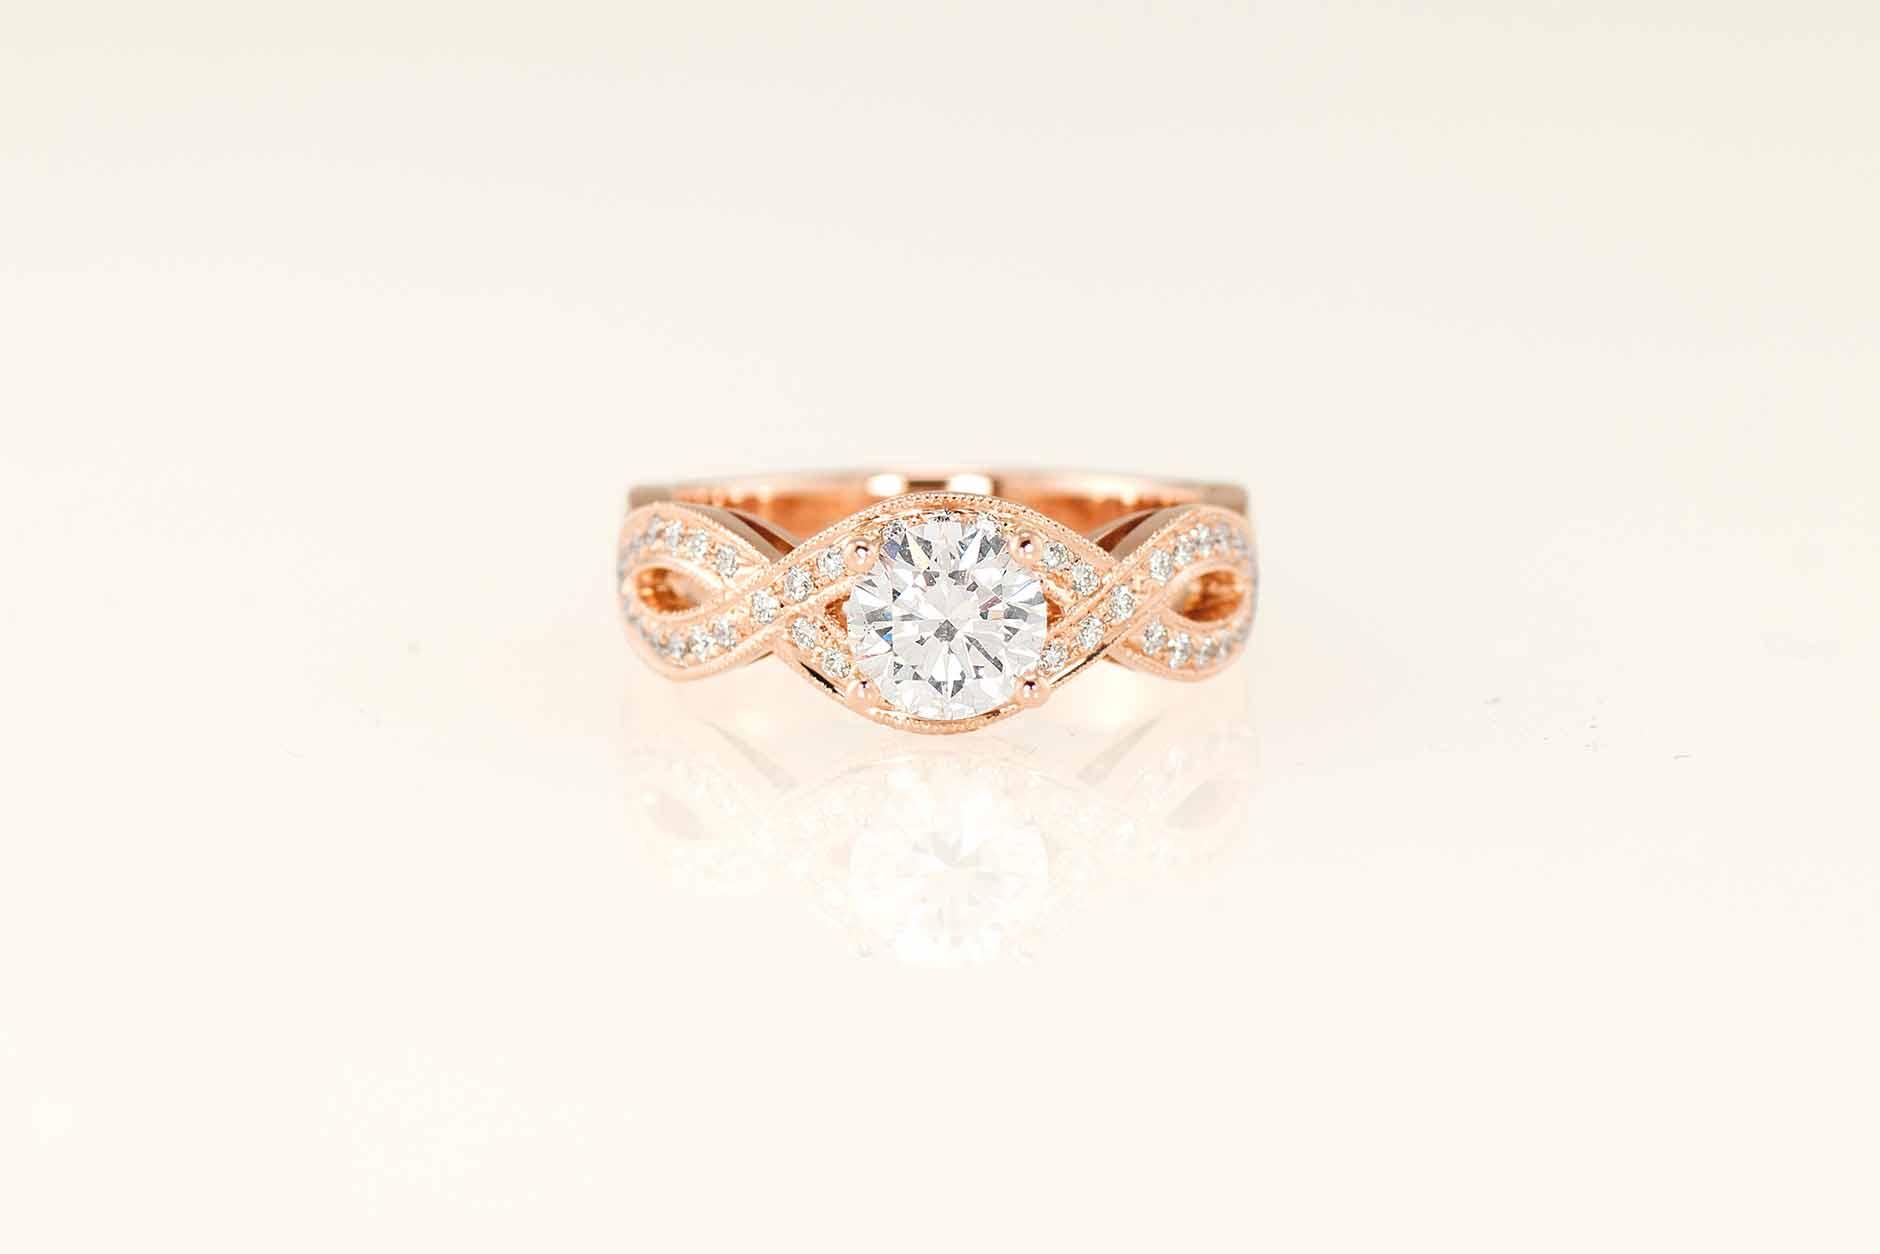 Infinity - Custom 18k Rose Gold Diamond Engagement Ring - NEWA Goldsmith